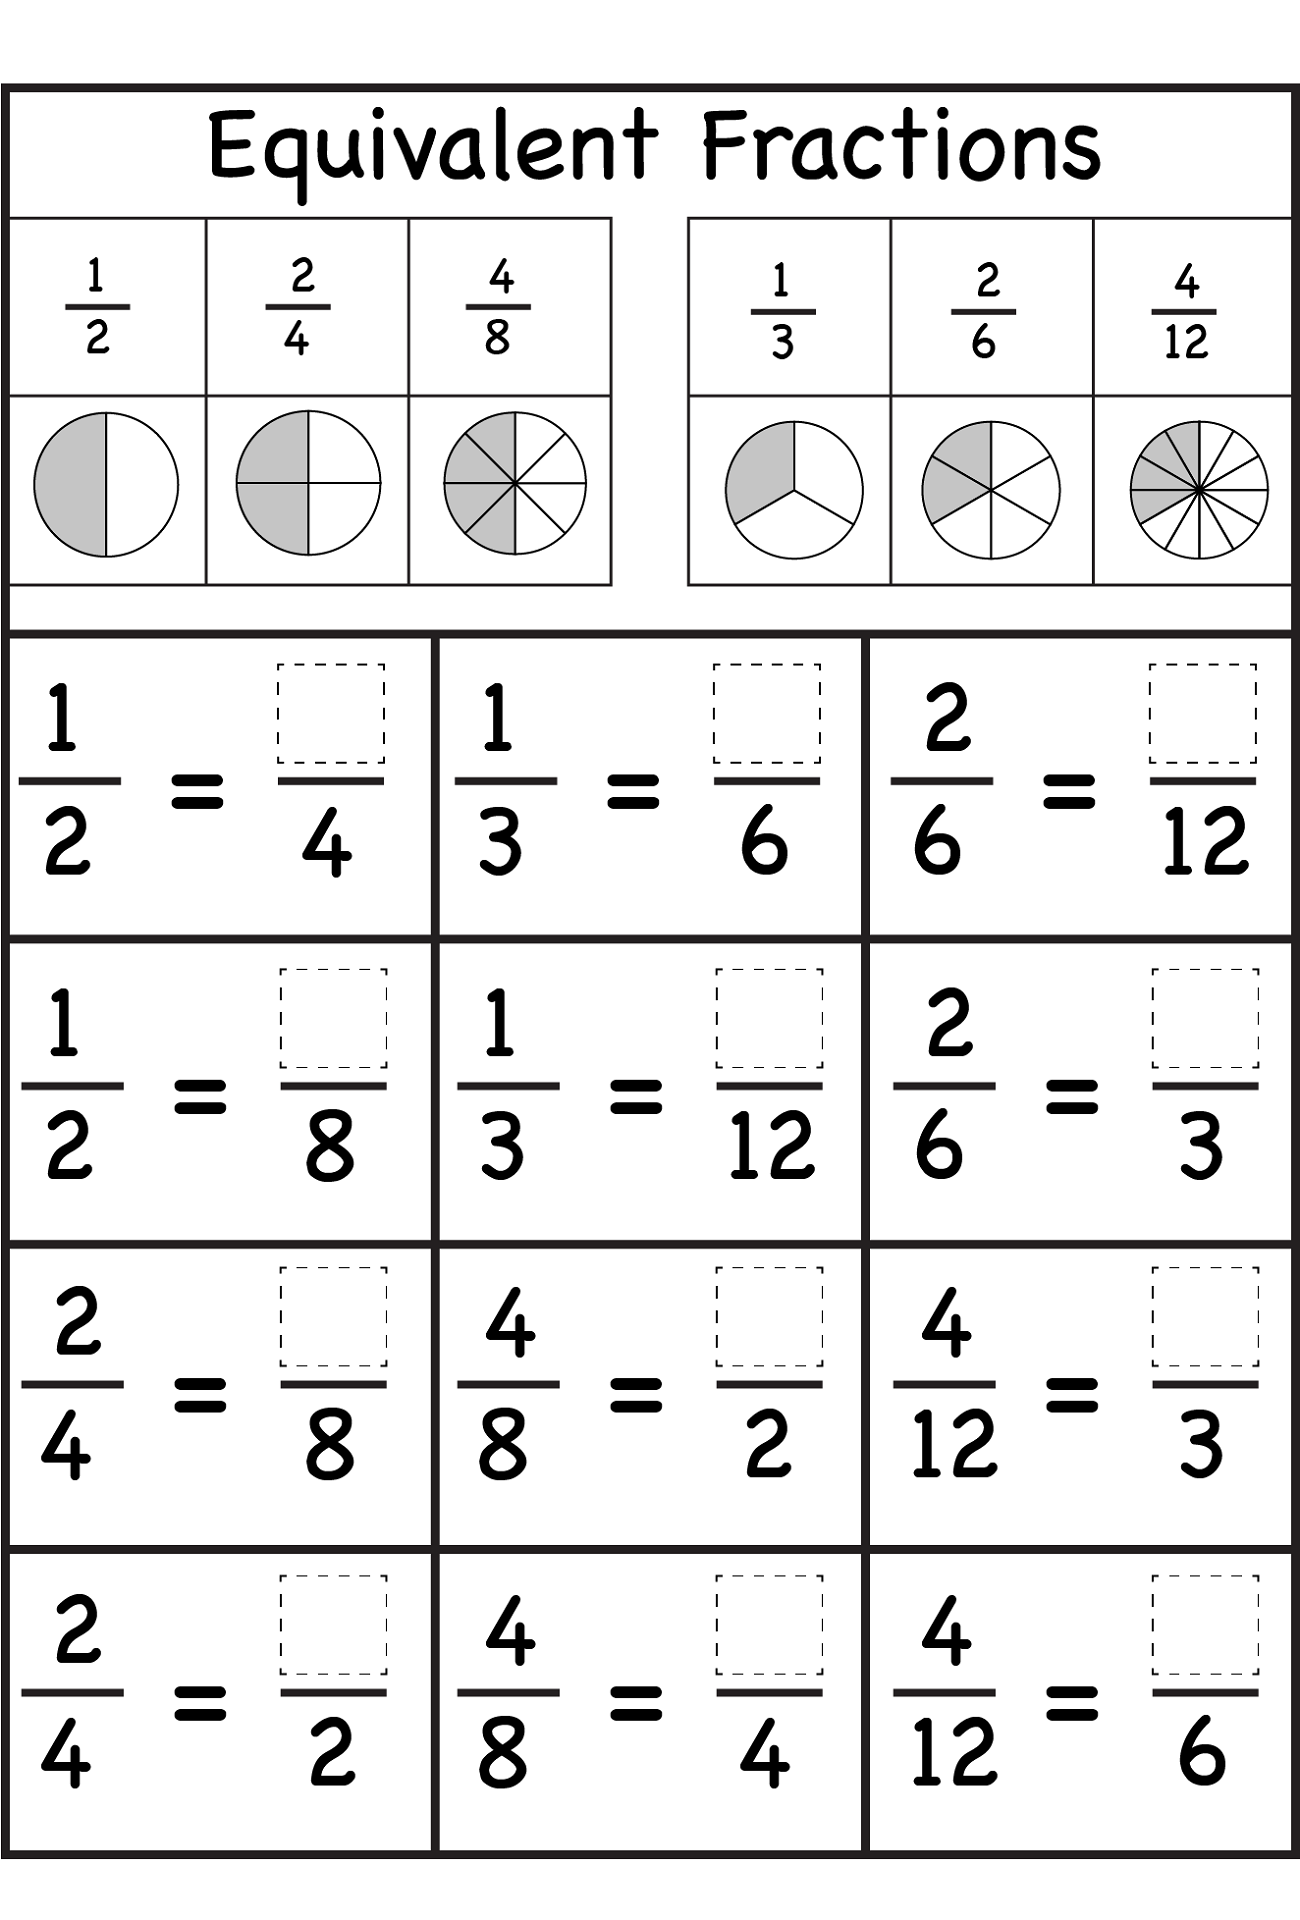 Math Fraction Worksheets For Kids Learning Printable In 2020 Math Fractions Worksheets Math Fractions Fractions Worksheets